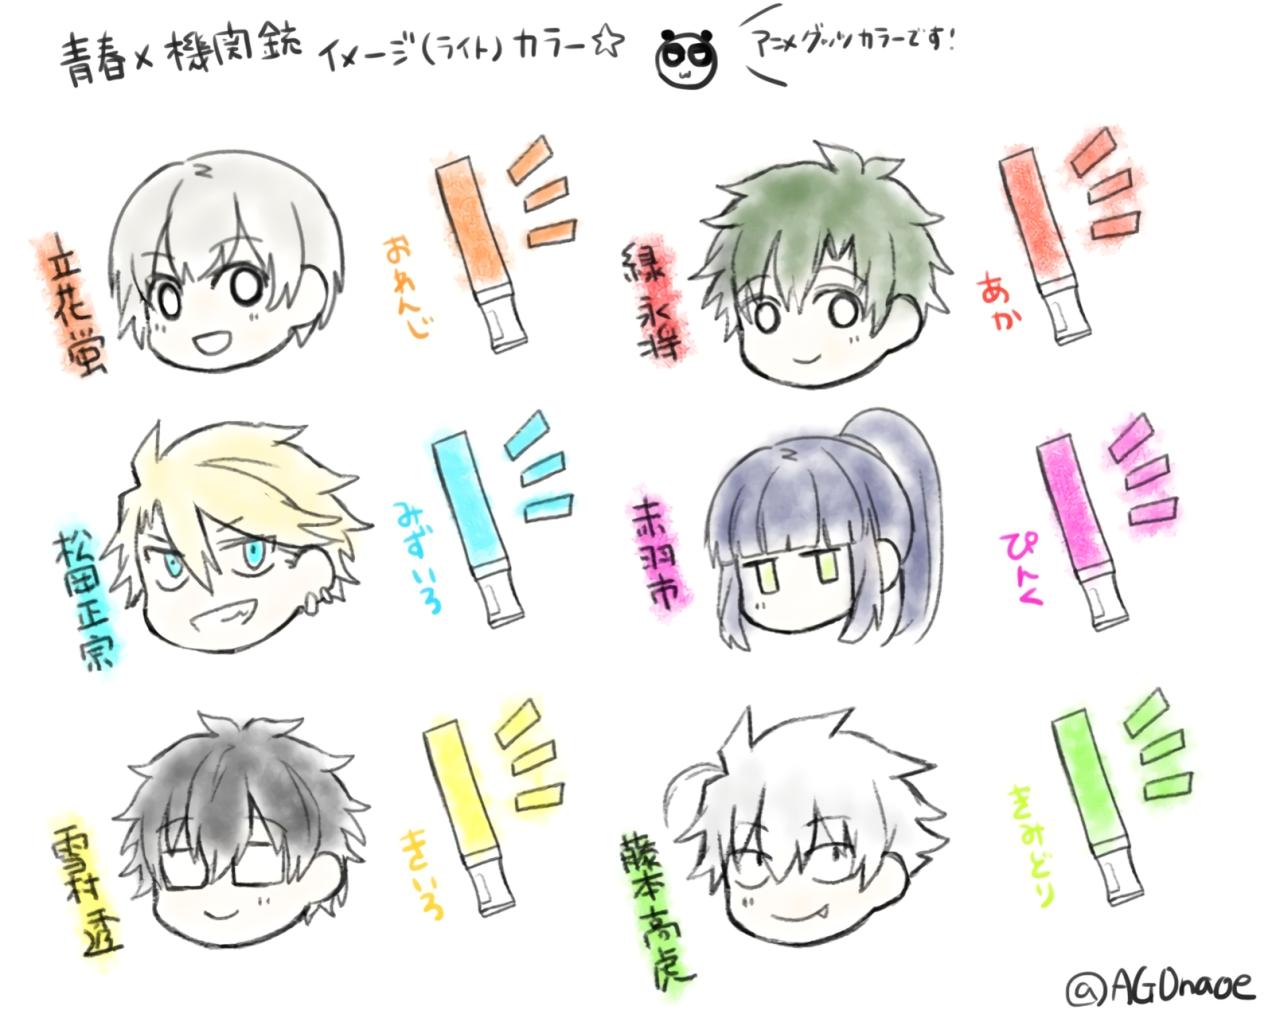 I'm all about BL, Bromance, Bishounen, and Bittersweet anime and manga. Cuji Yuki is Love Cuji Yuki...